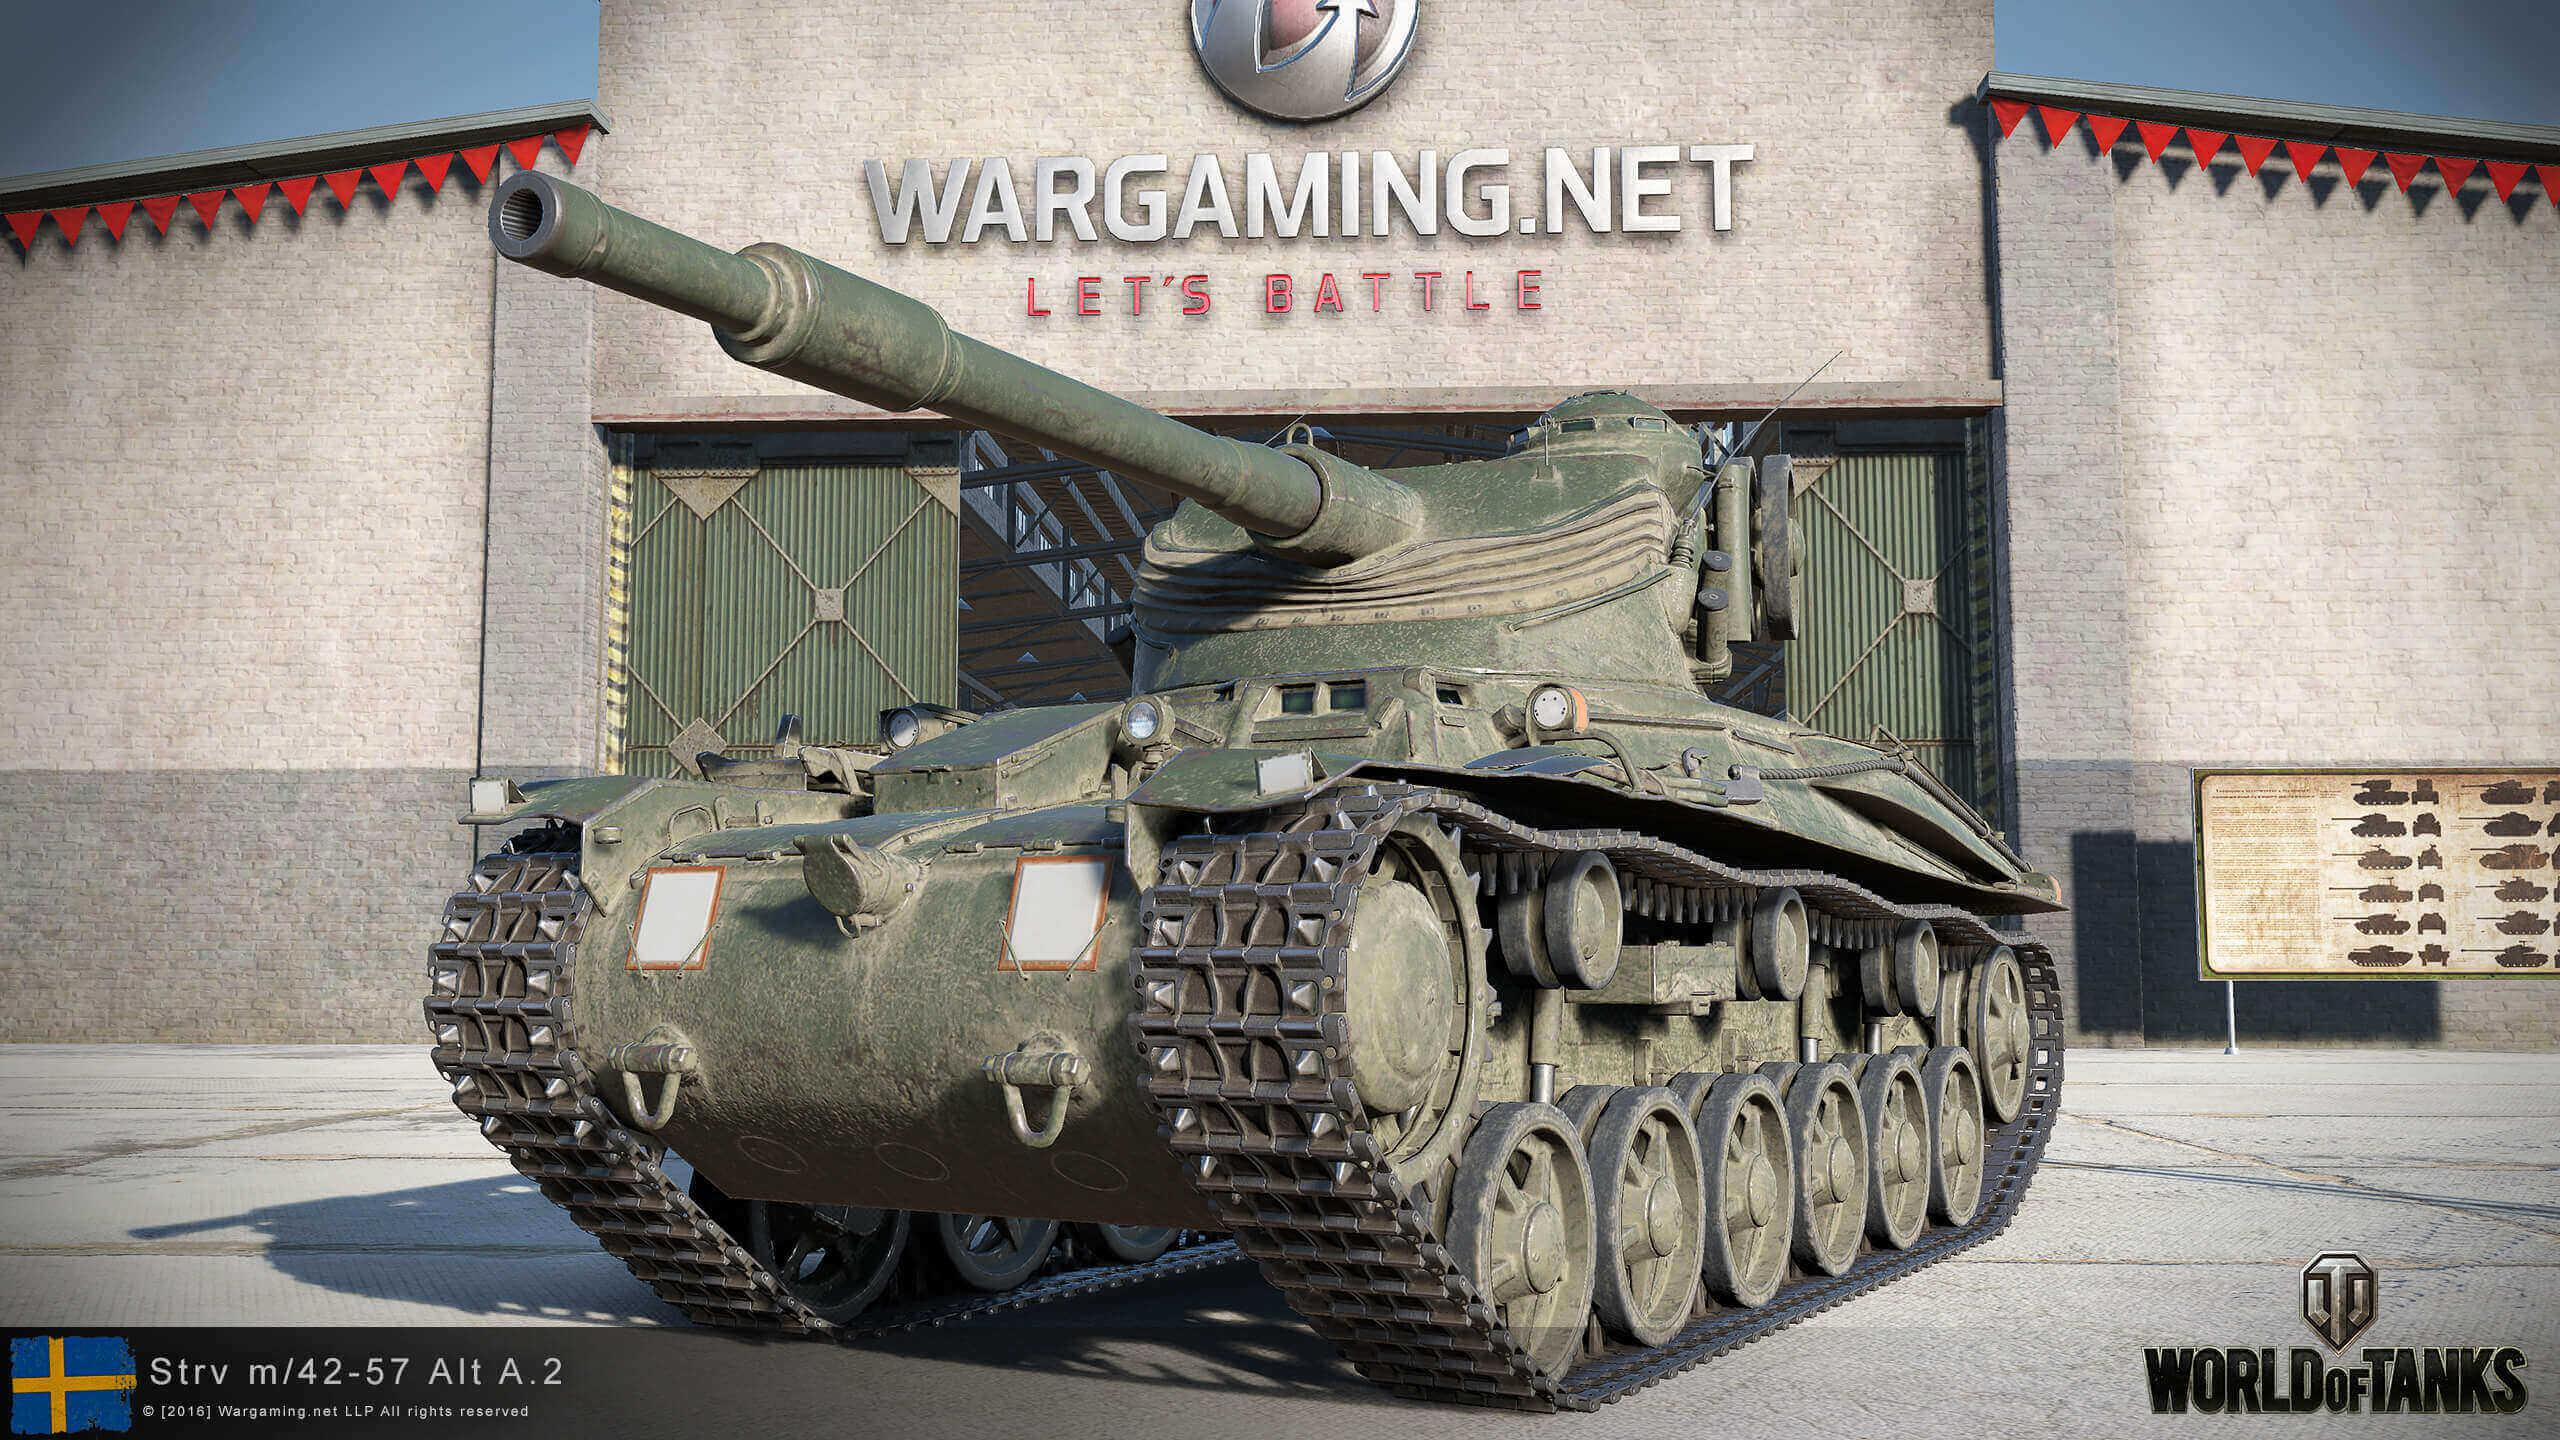 World of tanks hangs updating tankers